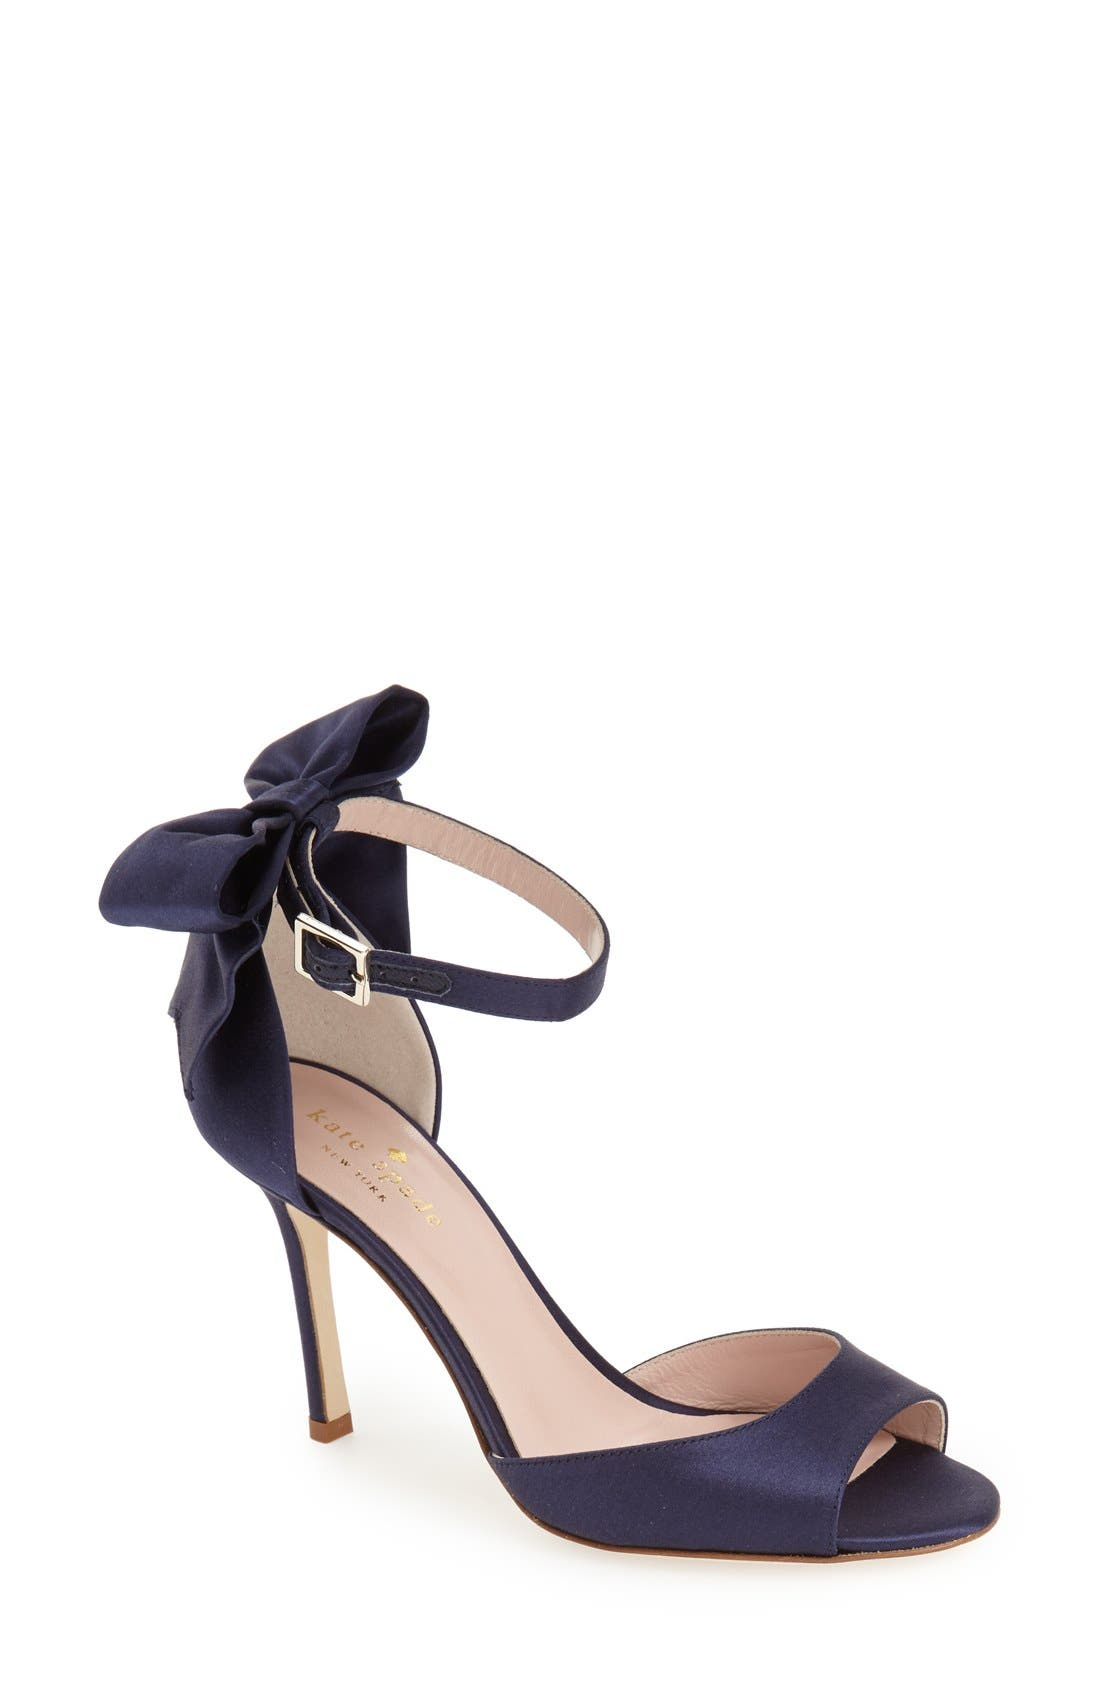 'izzie' sandal,                             Main thumbnail 1, color,                             Navy Satin